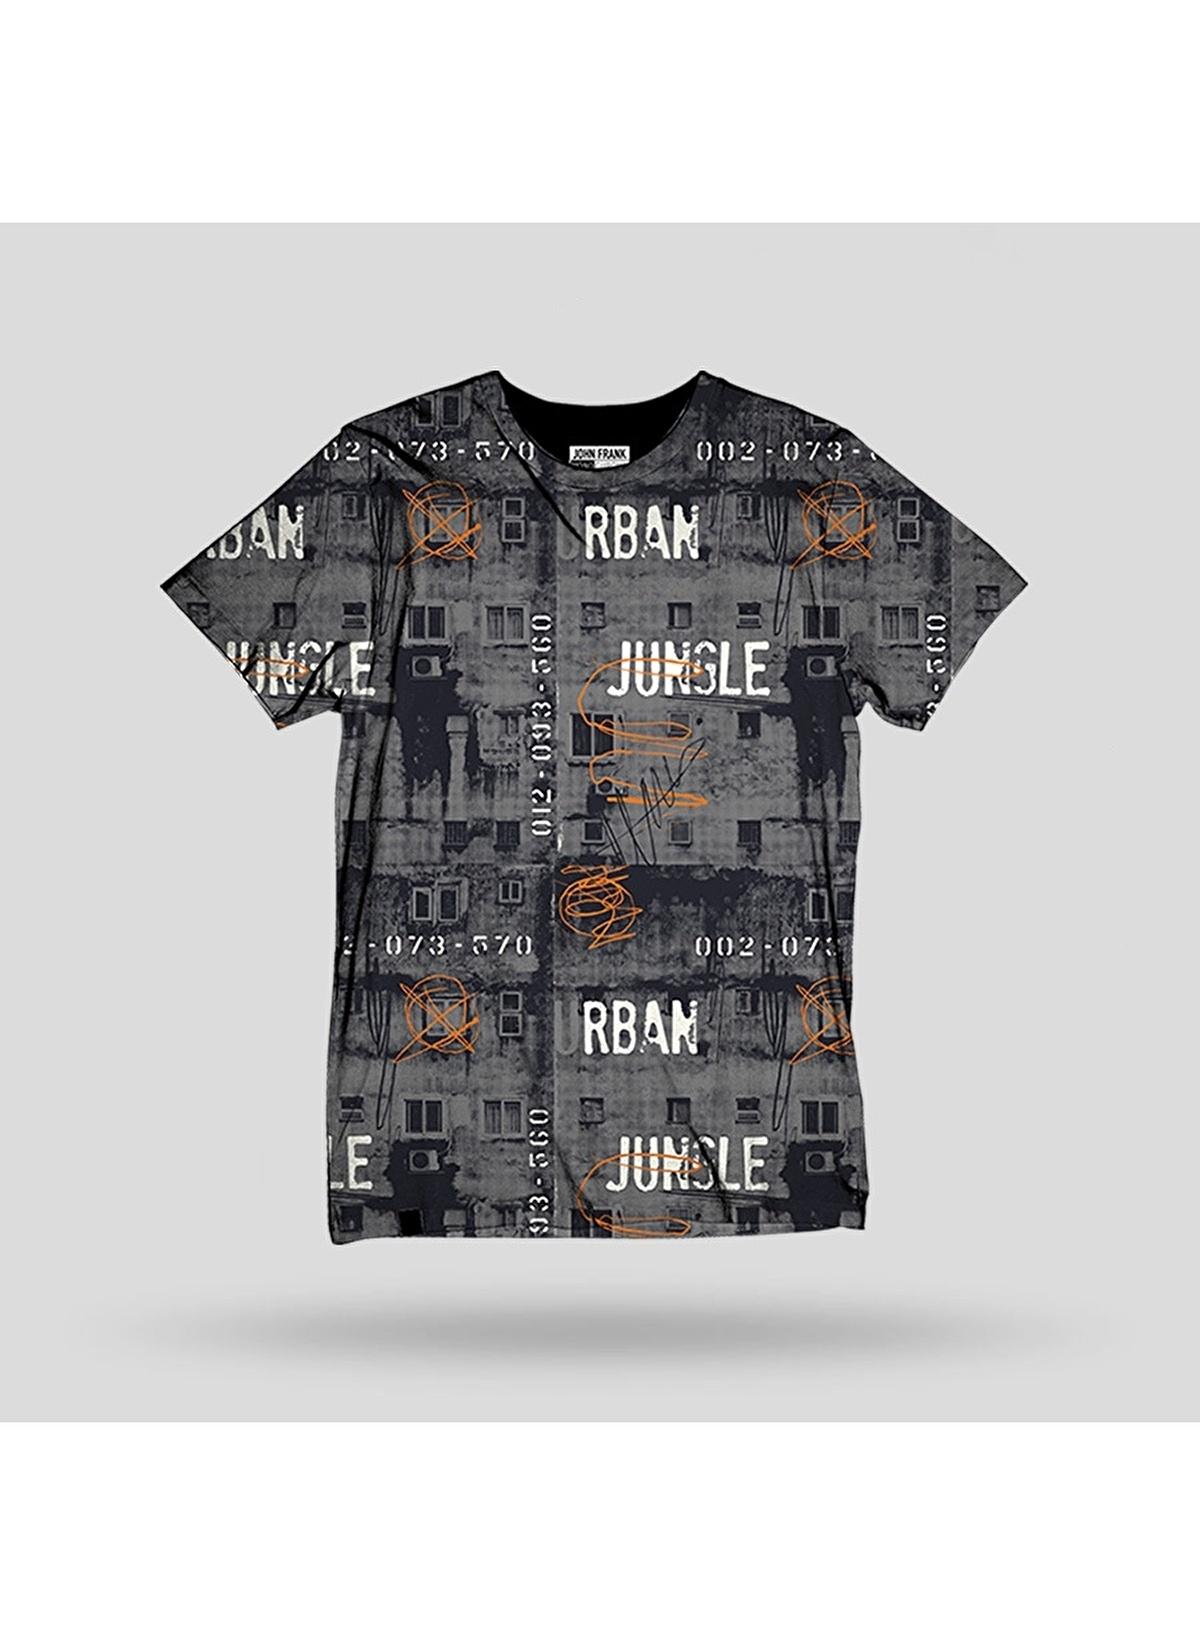 John Frank Tişört Jftd16-urban Baskılı Dijital T-shirt – 79.99 TL